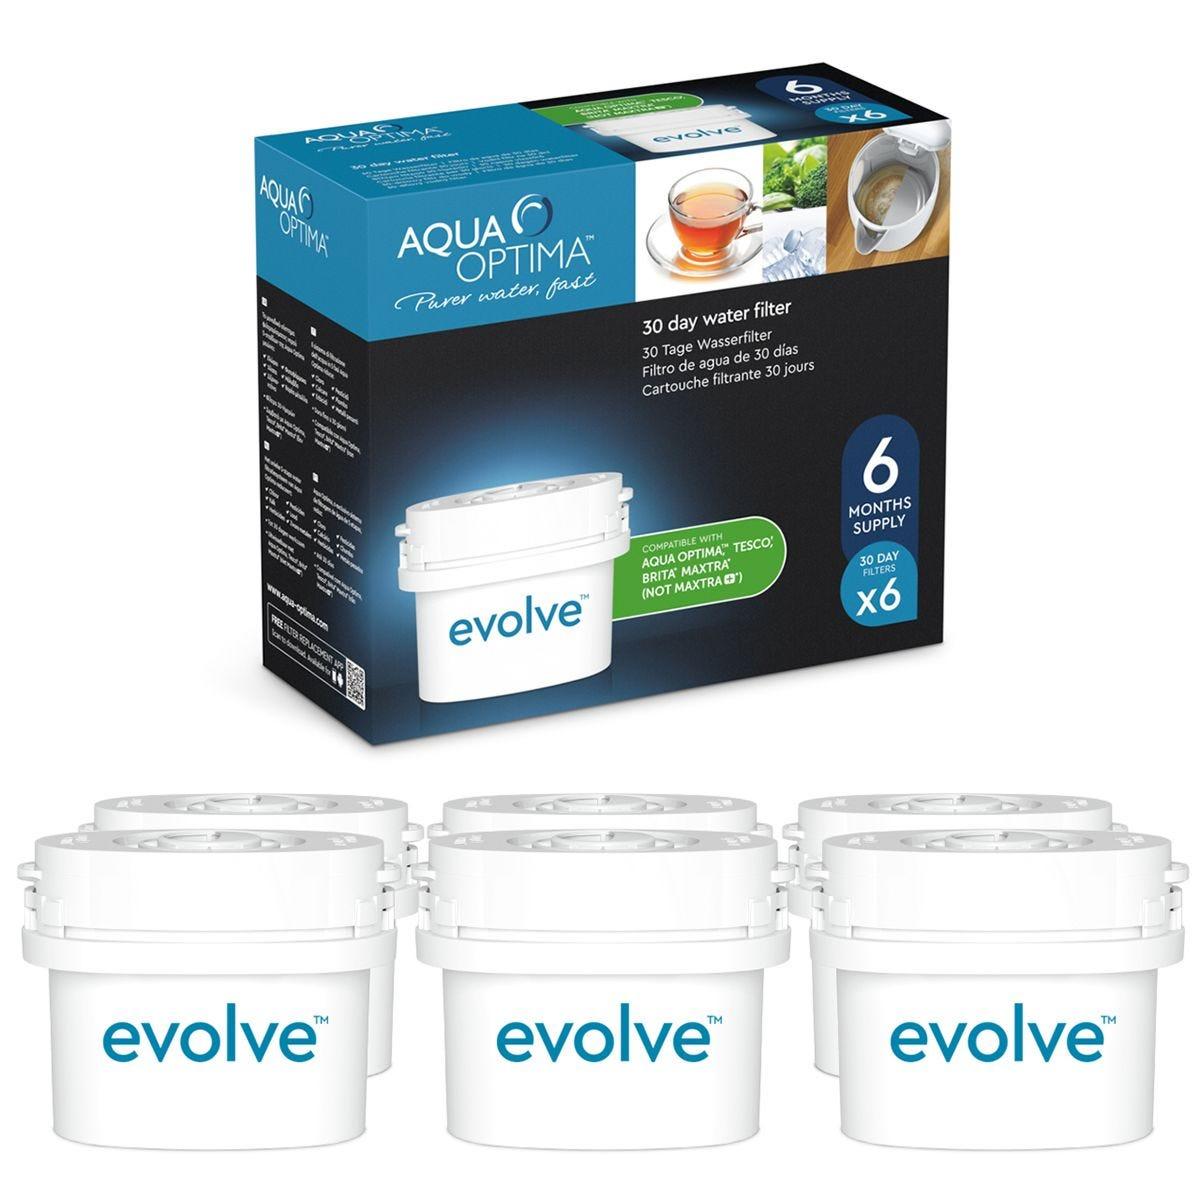 Aqua Optima Evolve 30-Day Water Filter Cartridges - 6 Pack